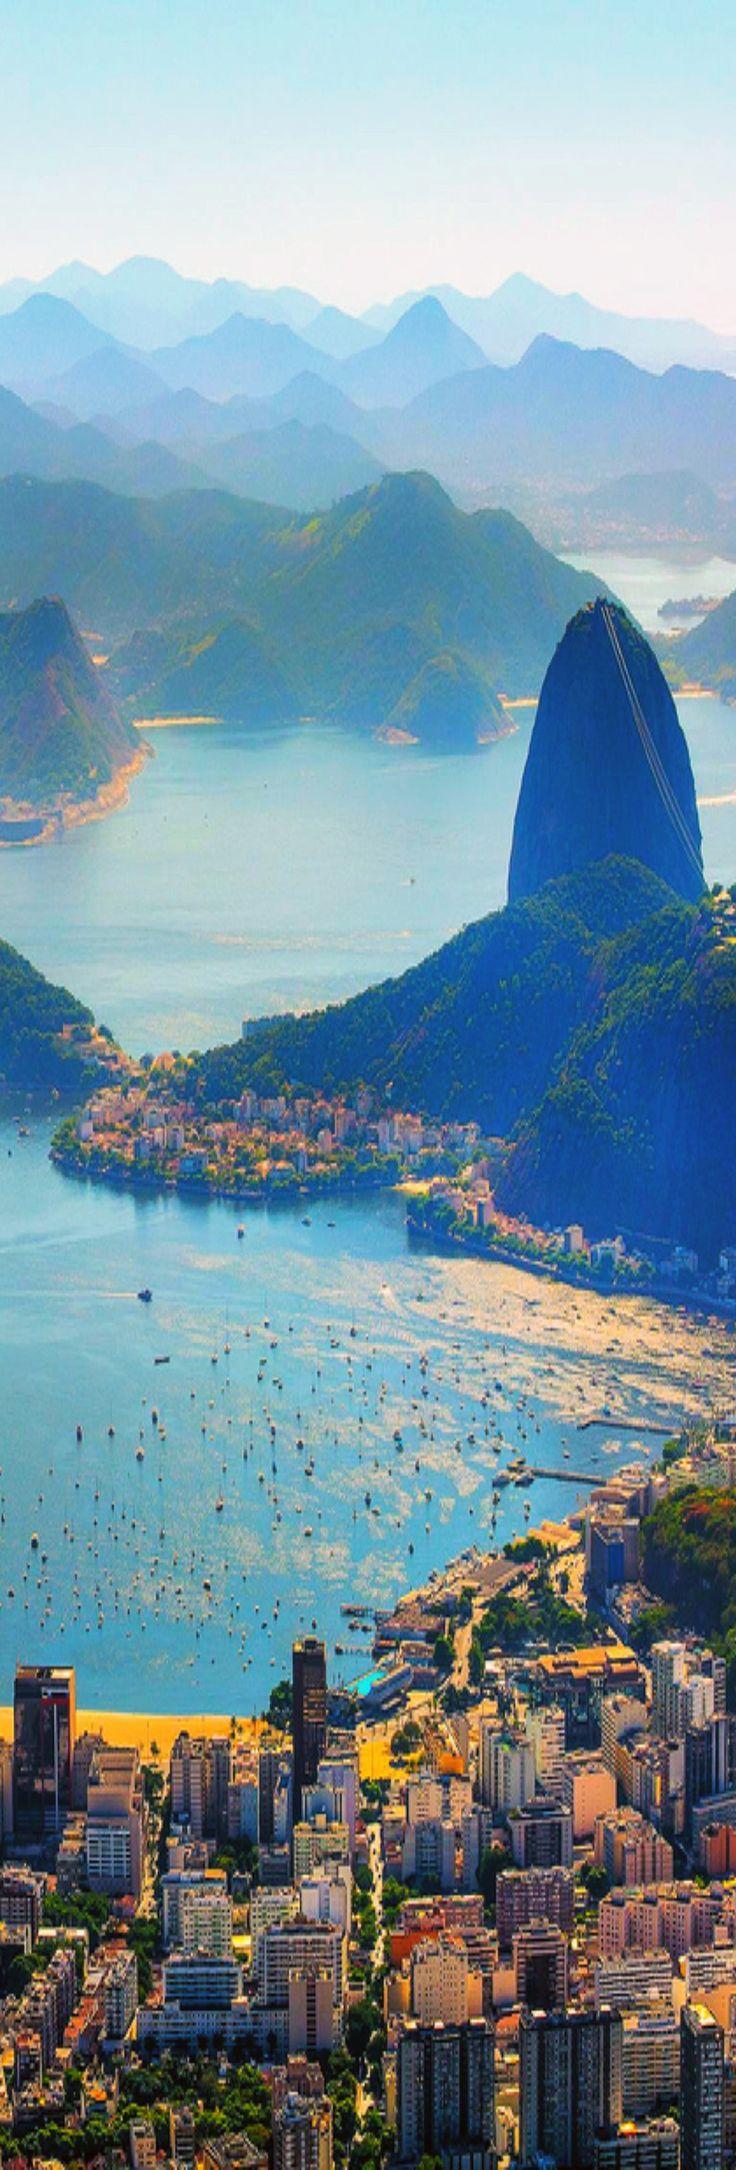 #jemevade #ledeclicanticlope / Bresil - Rio de Janeiro. Via creccord1.tumblr.com